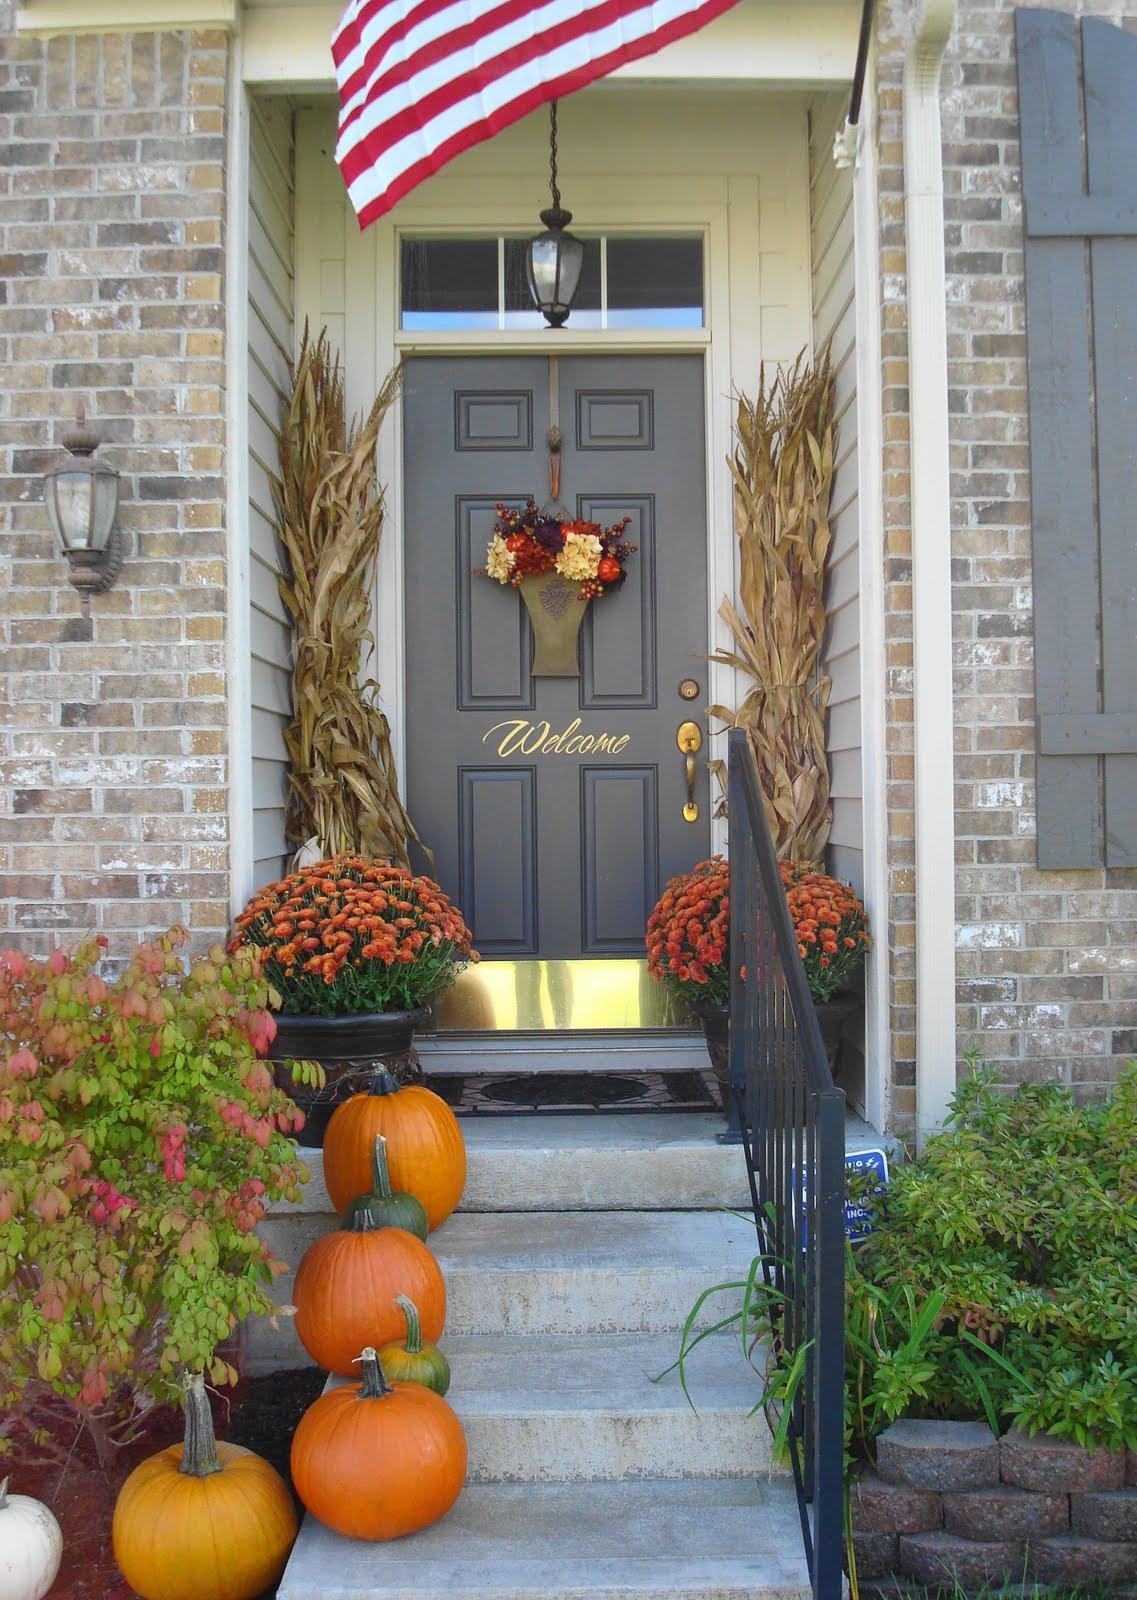 Fullsize Of Small Porch Ideas